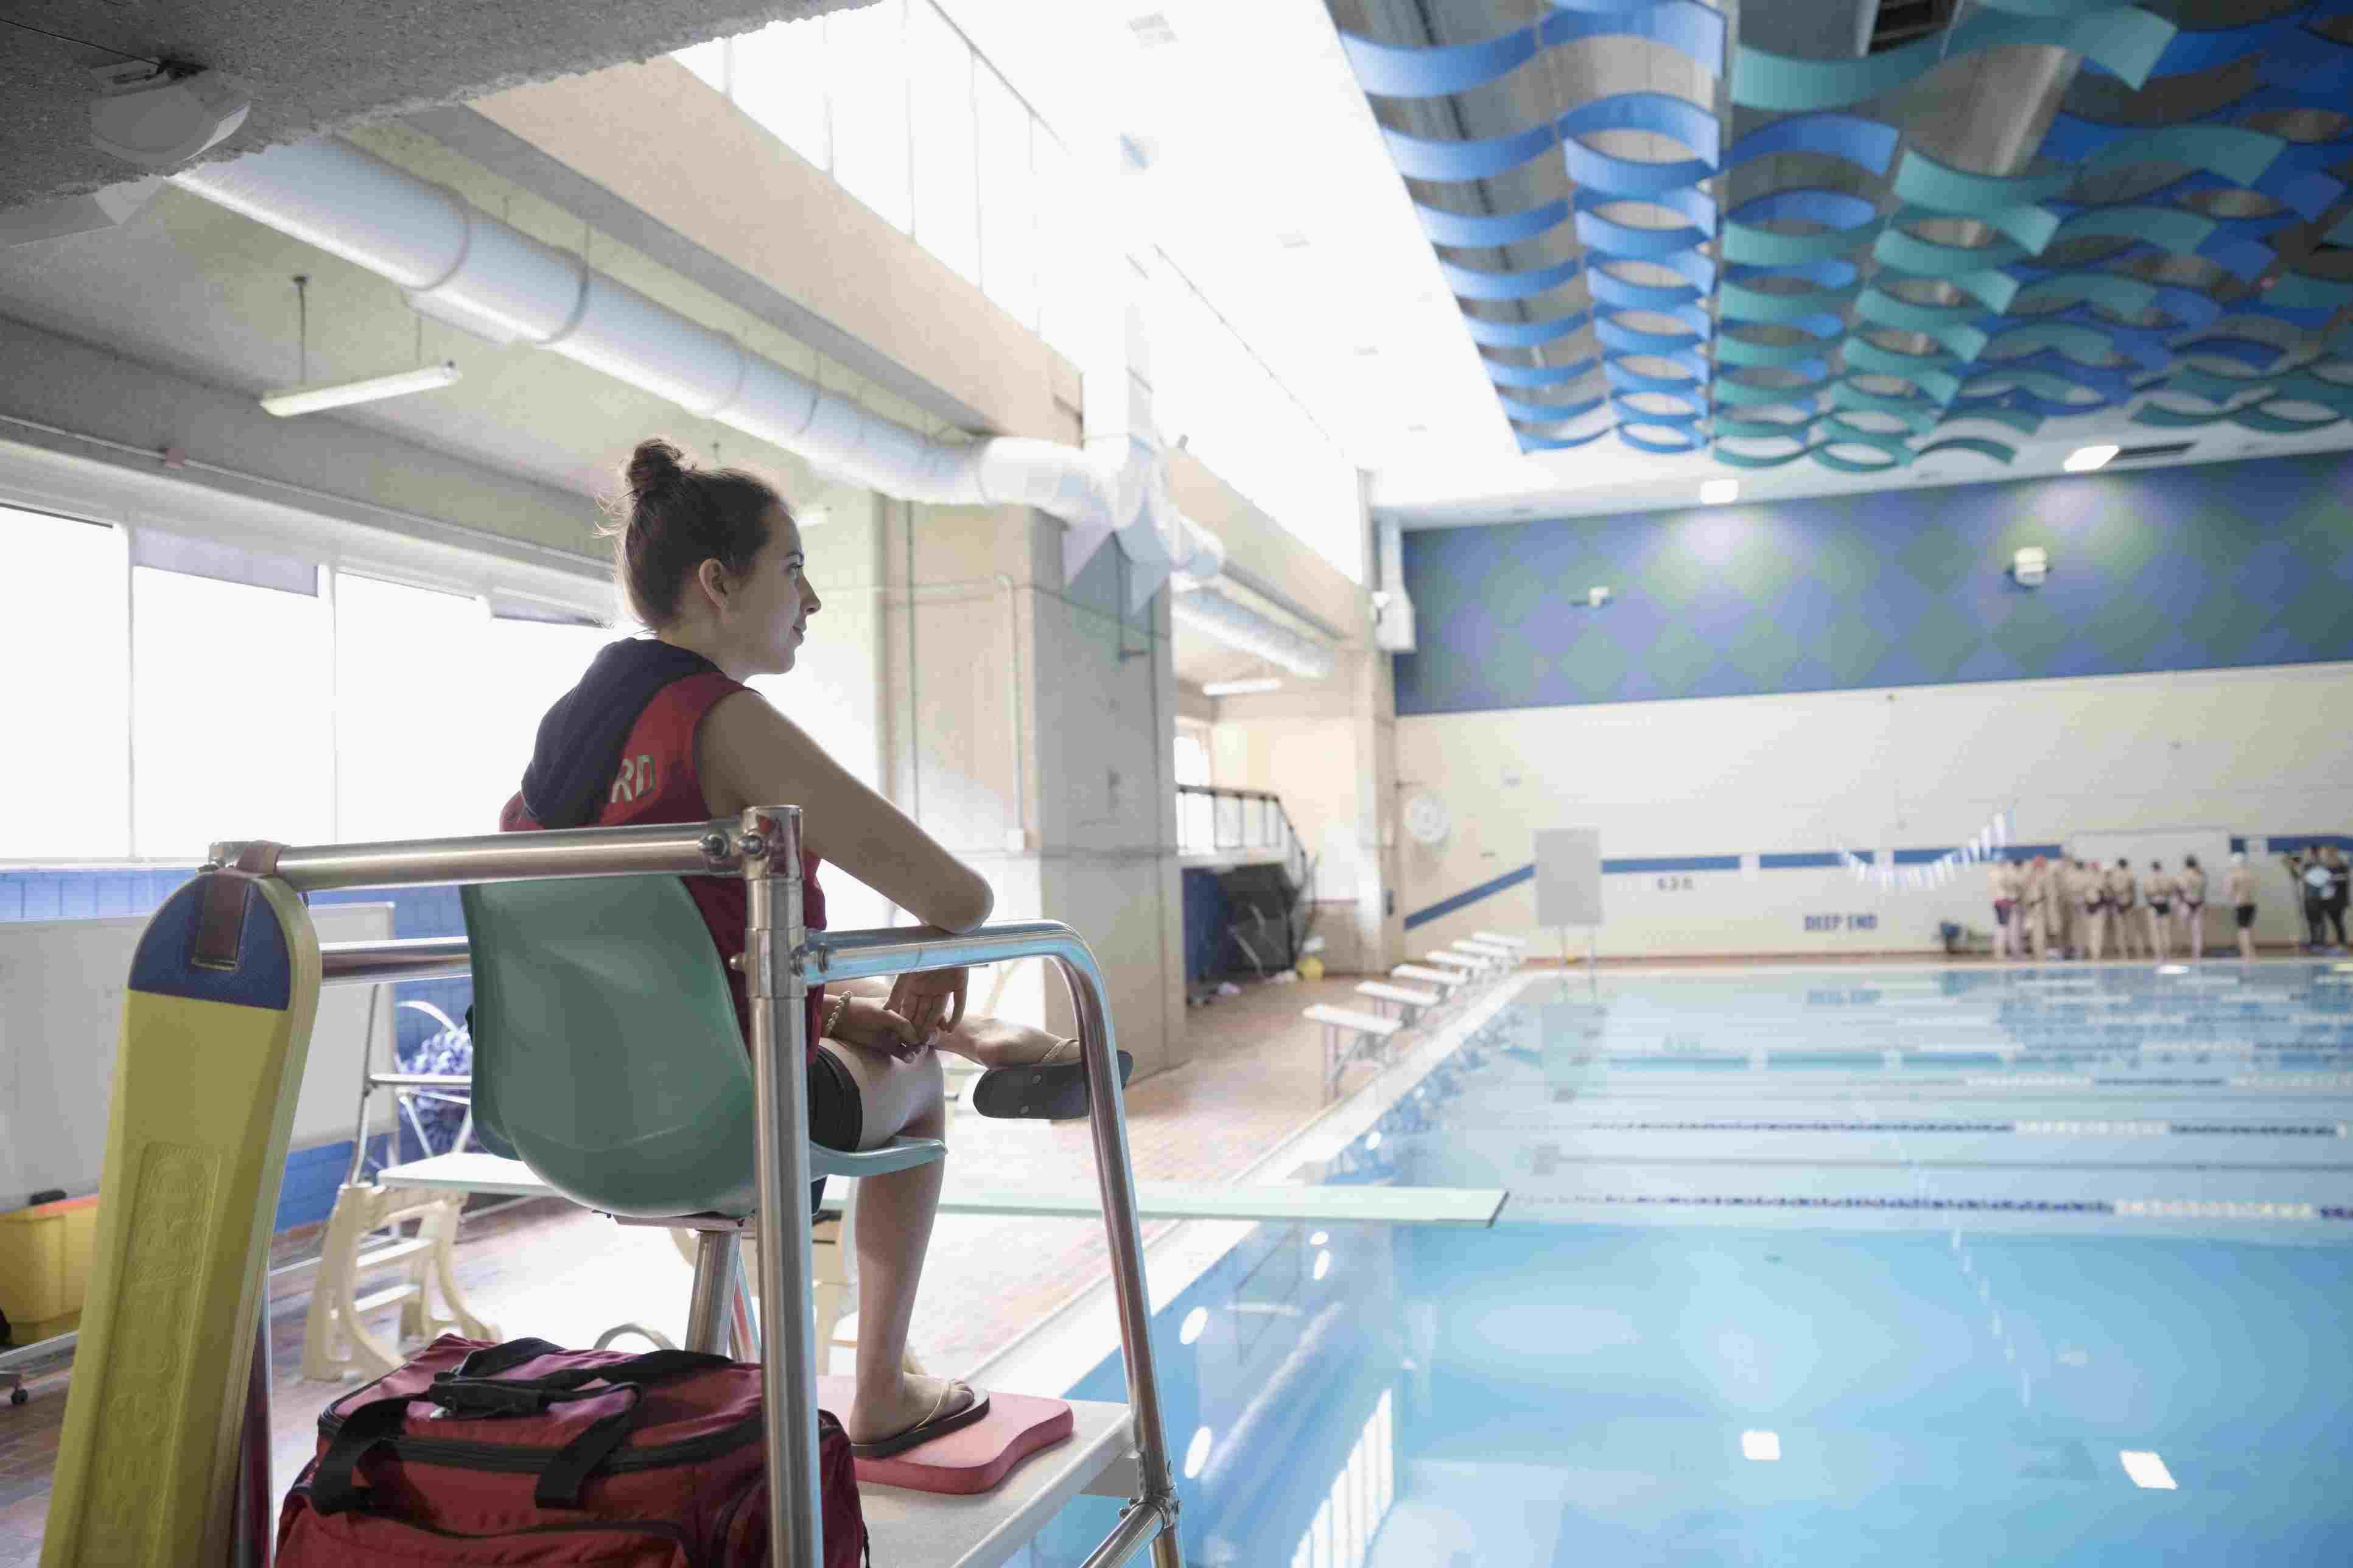 Female lifeguard sitting at lifeguard chair at swimming pool